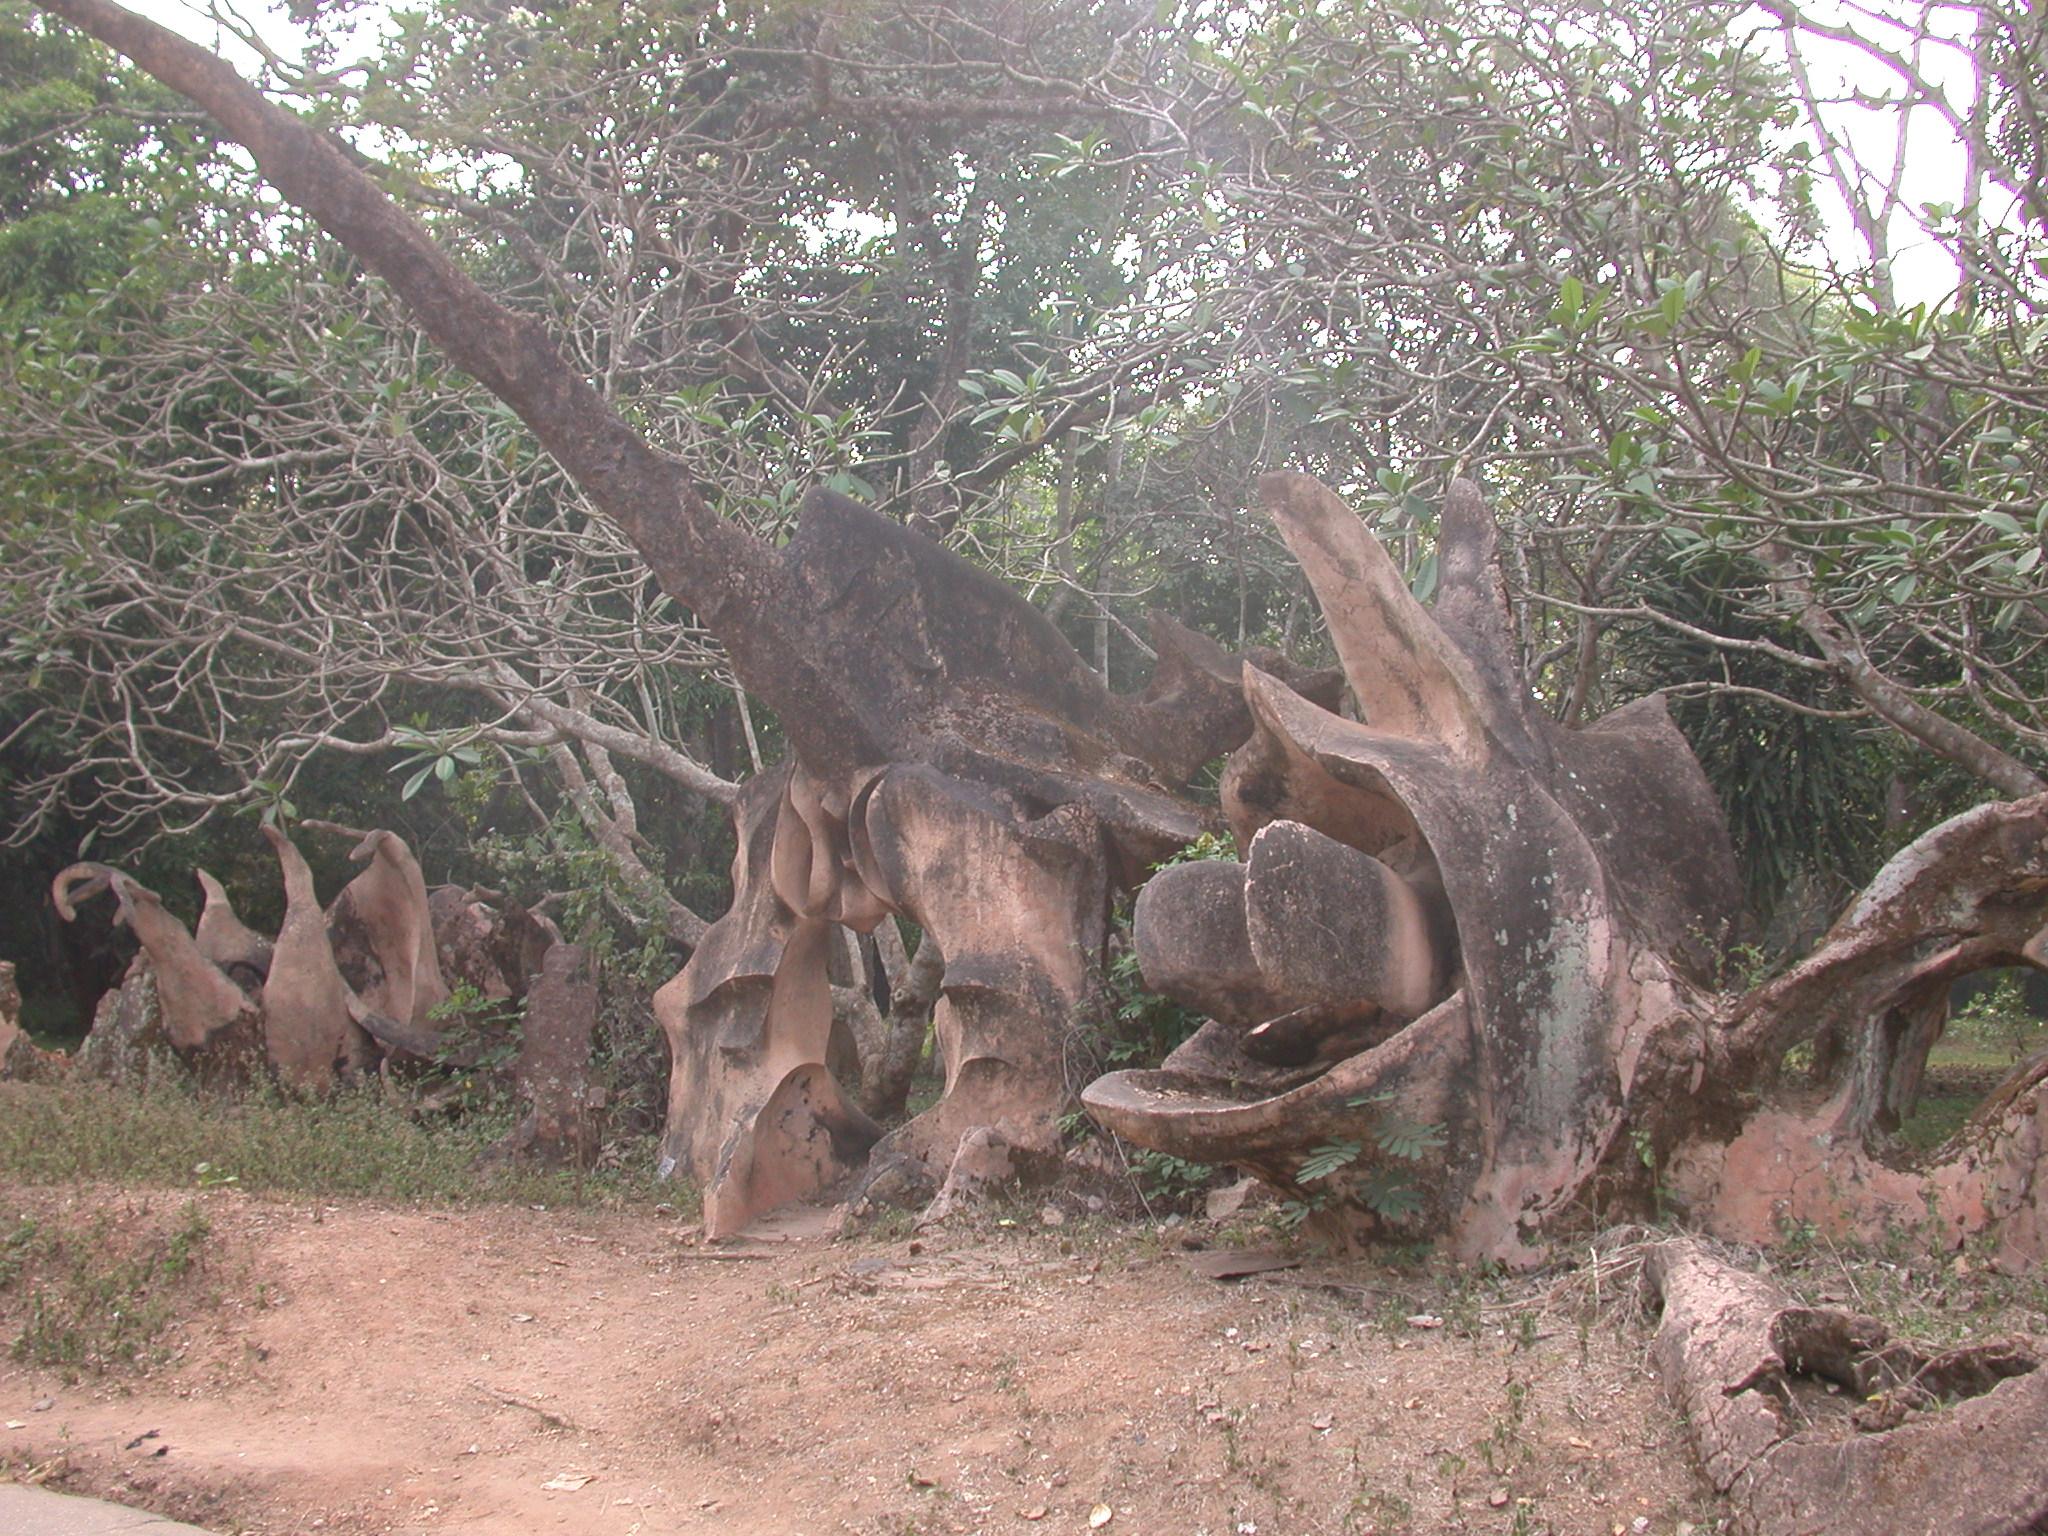 Chameleon Sculpture, Osun Sacred Grove, Oshogbo, Nigeria